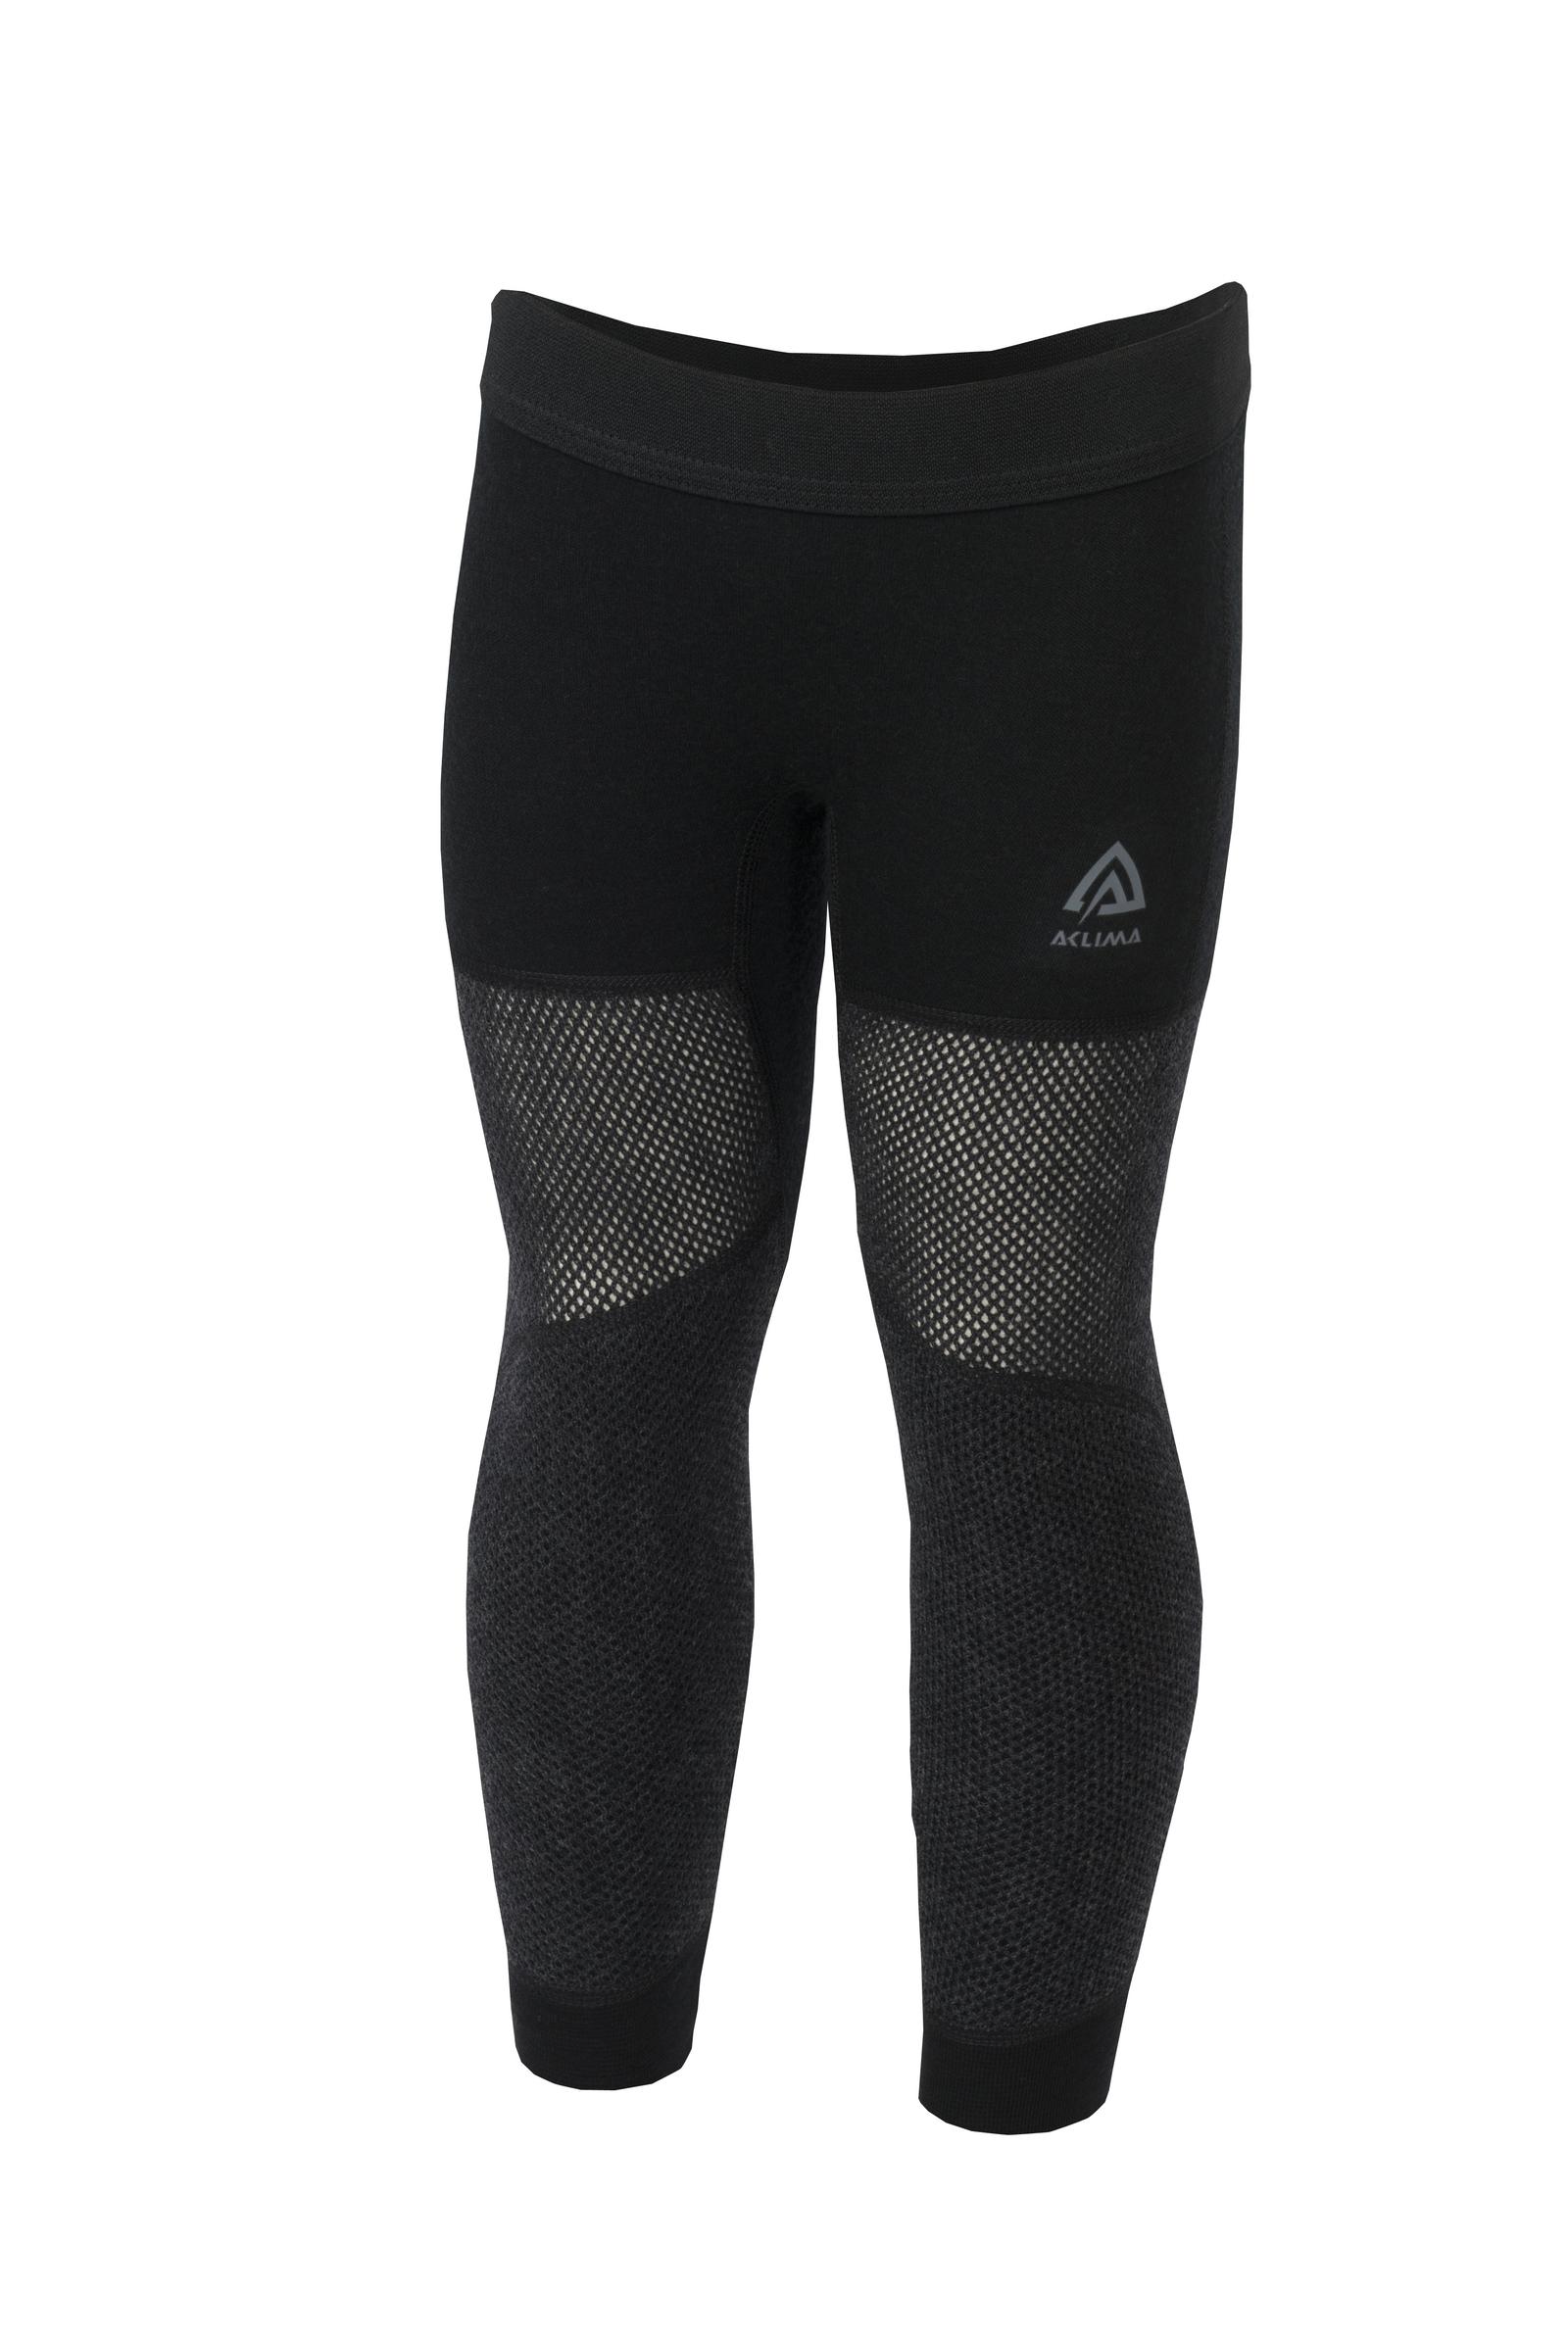 aclima woolnet mini longs junior - brace melange/jet black